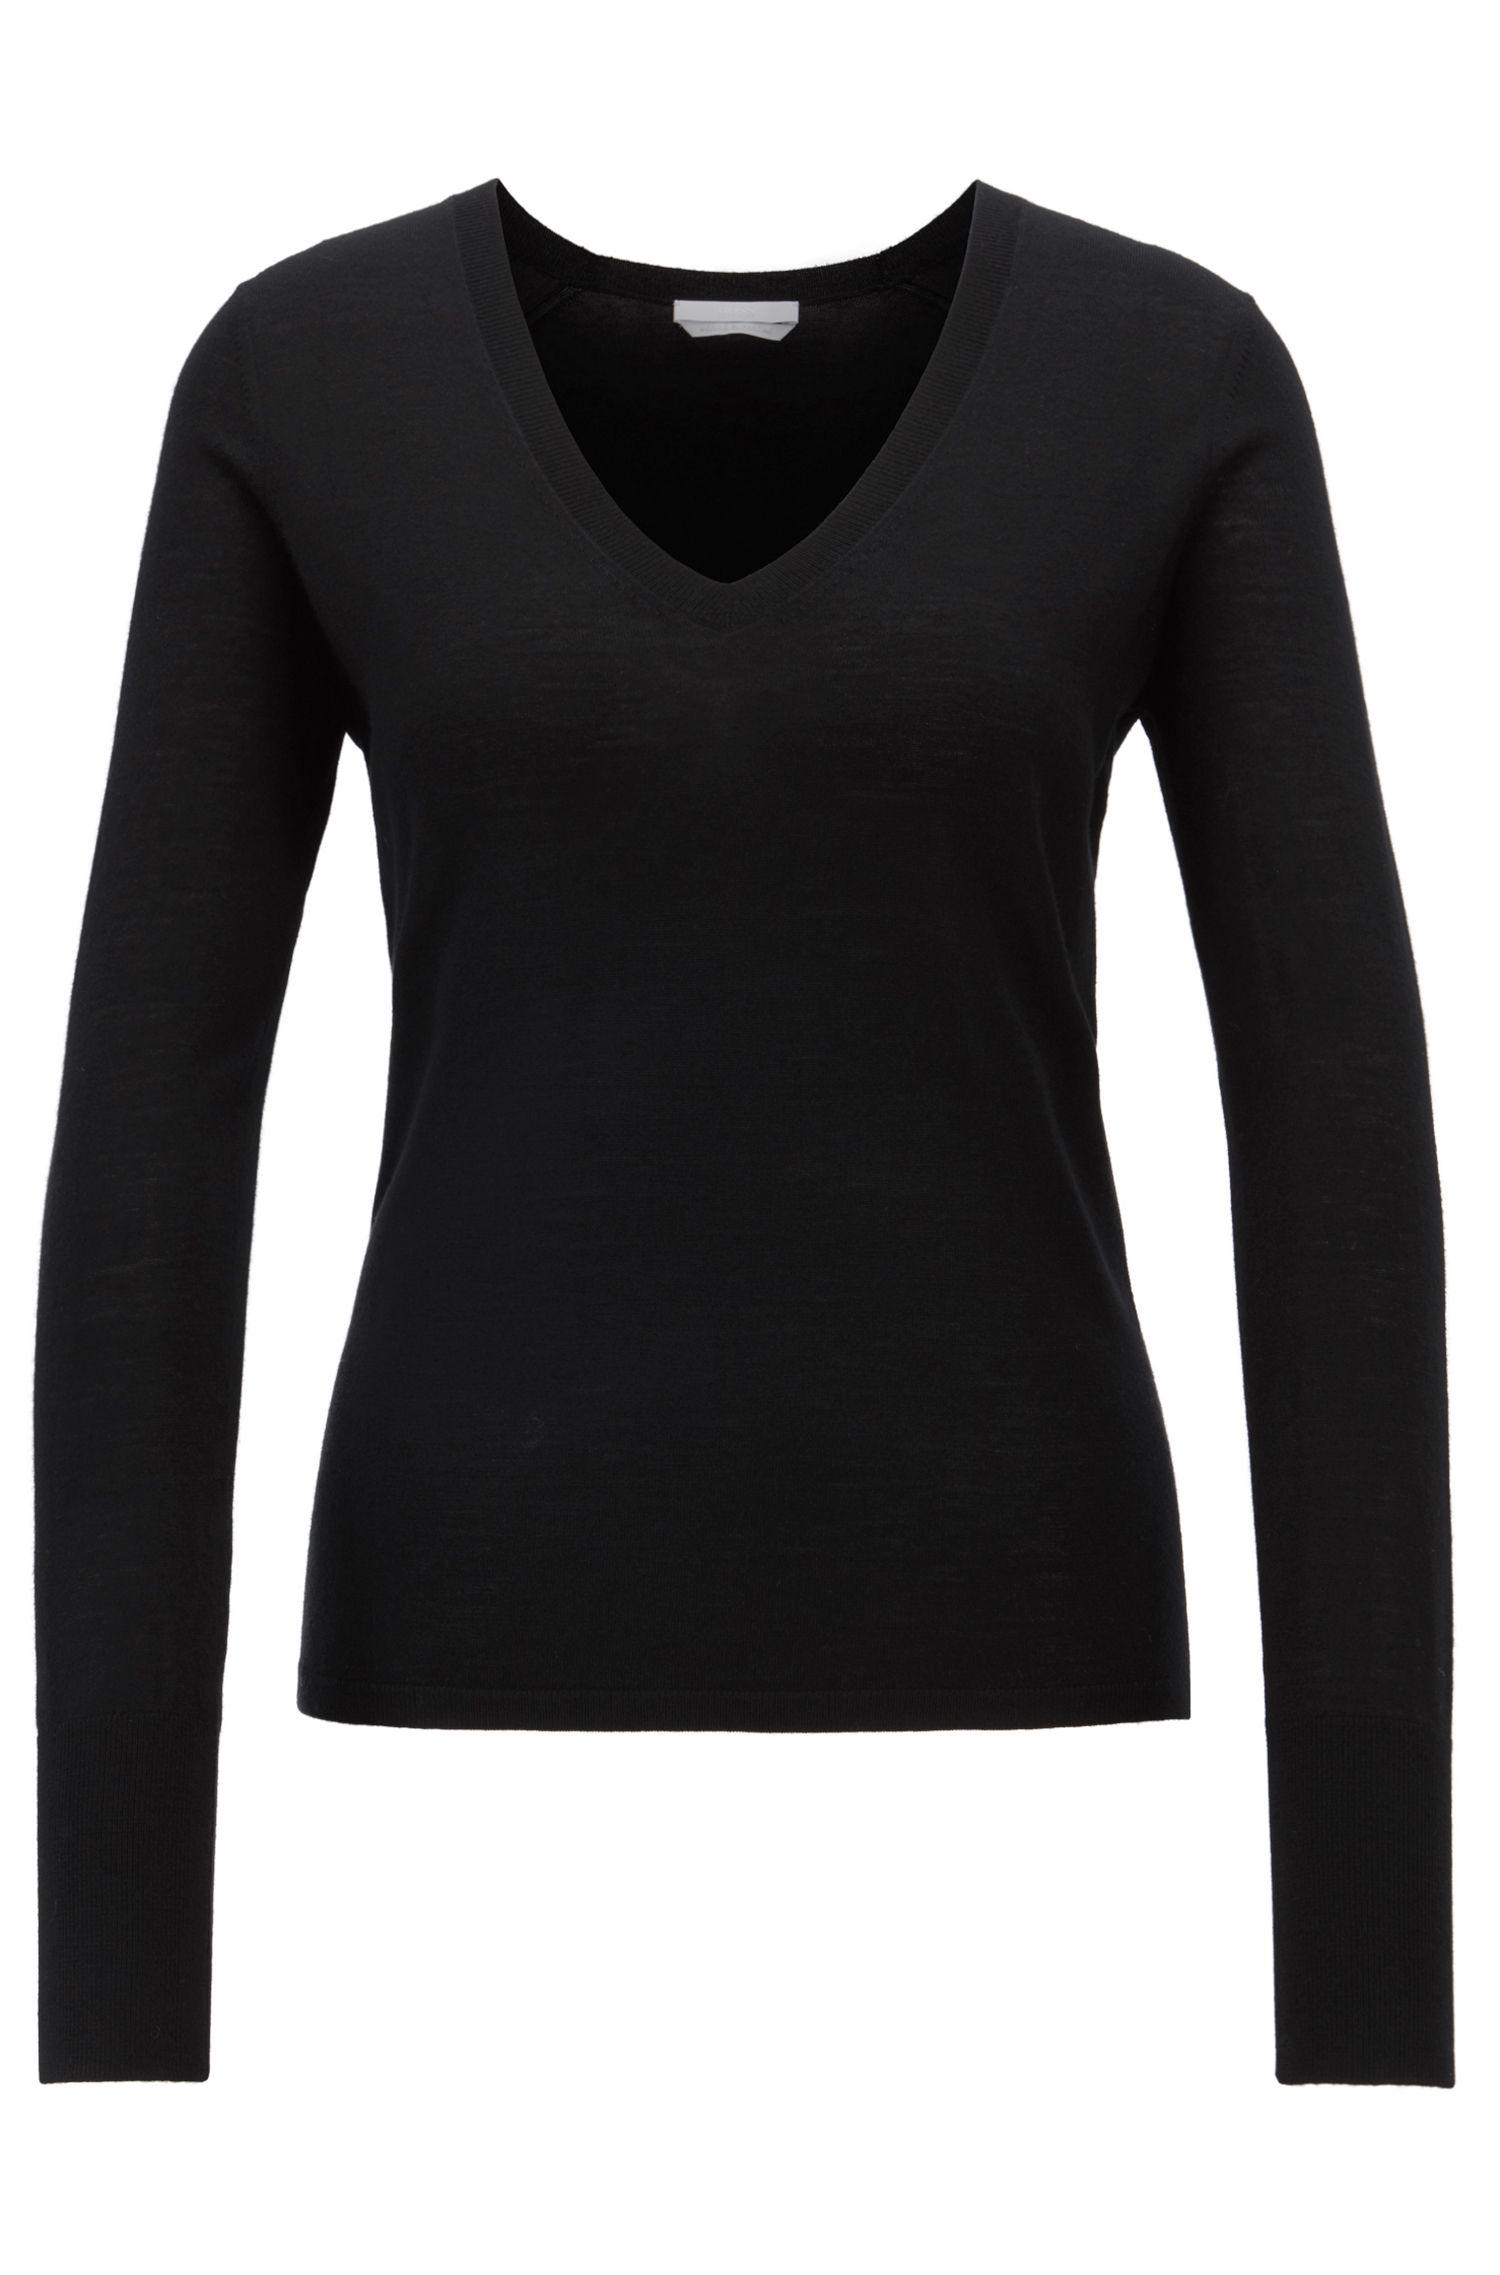 V-neck sweater in knitted virgin wool, Black